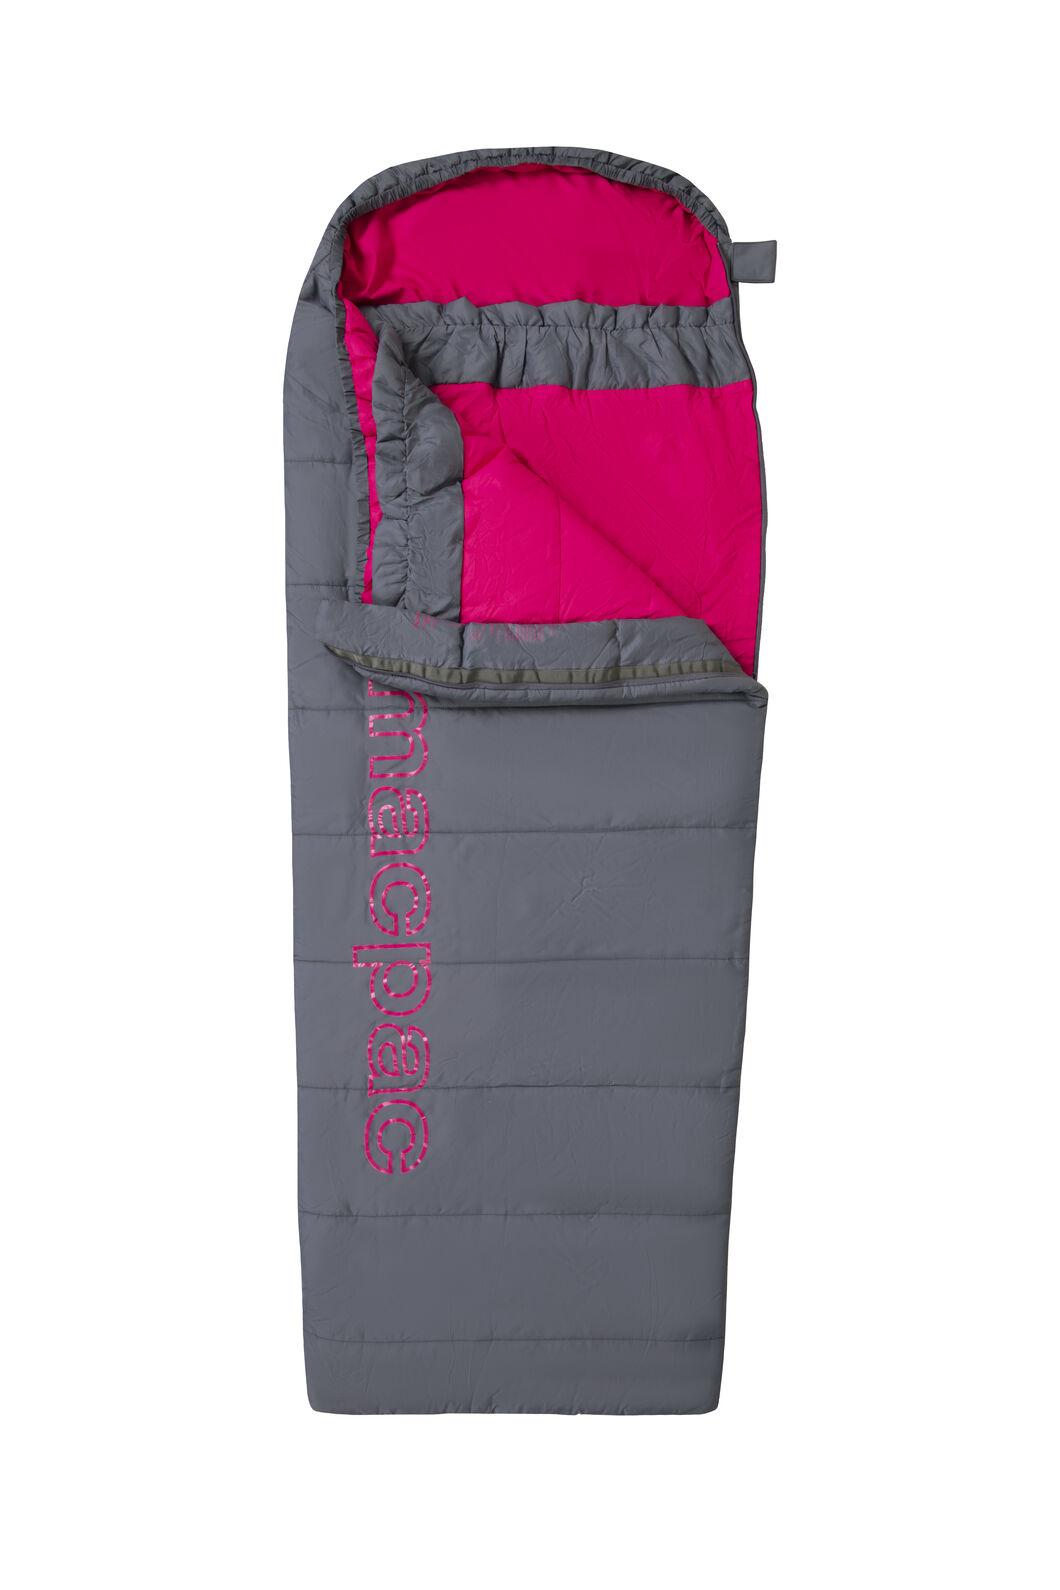 Macpac Roam 160 Sleeping Bag — Kids', Grisaille/Caberet, hi-res